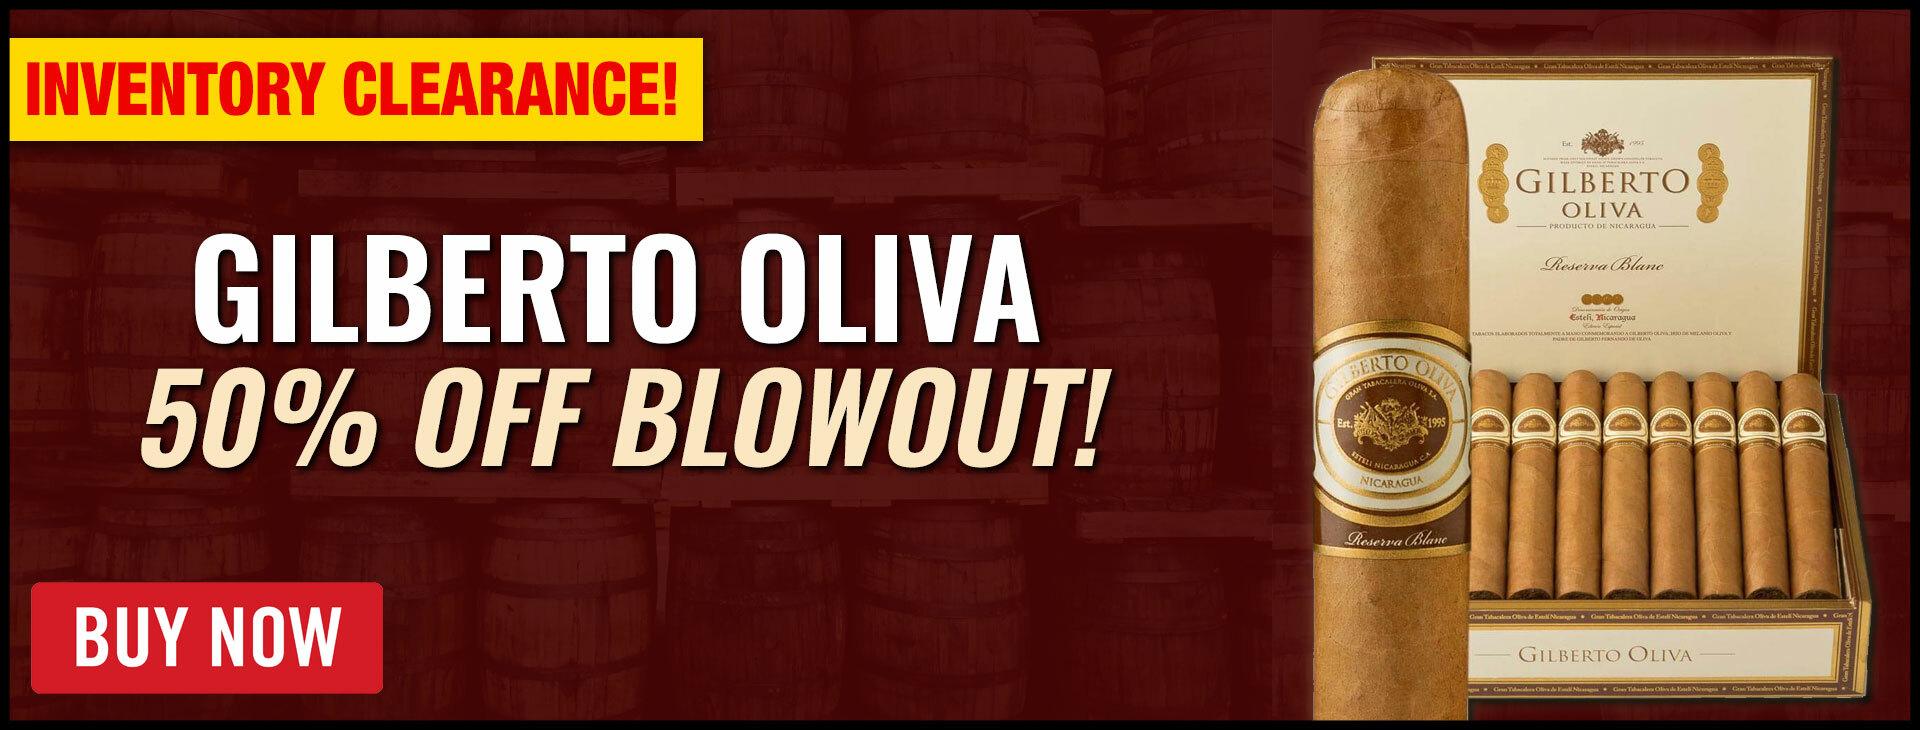 "50% OFF OLIVA ""GILBERTO OLIVA"""